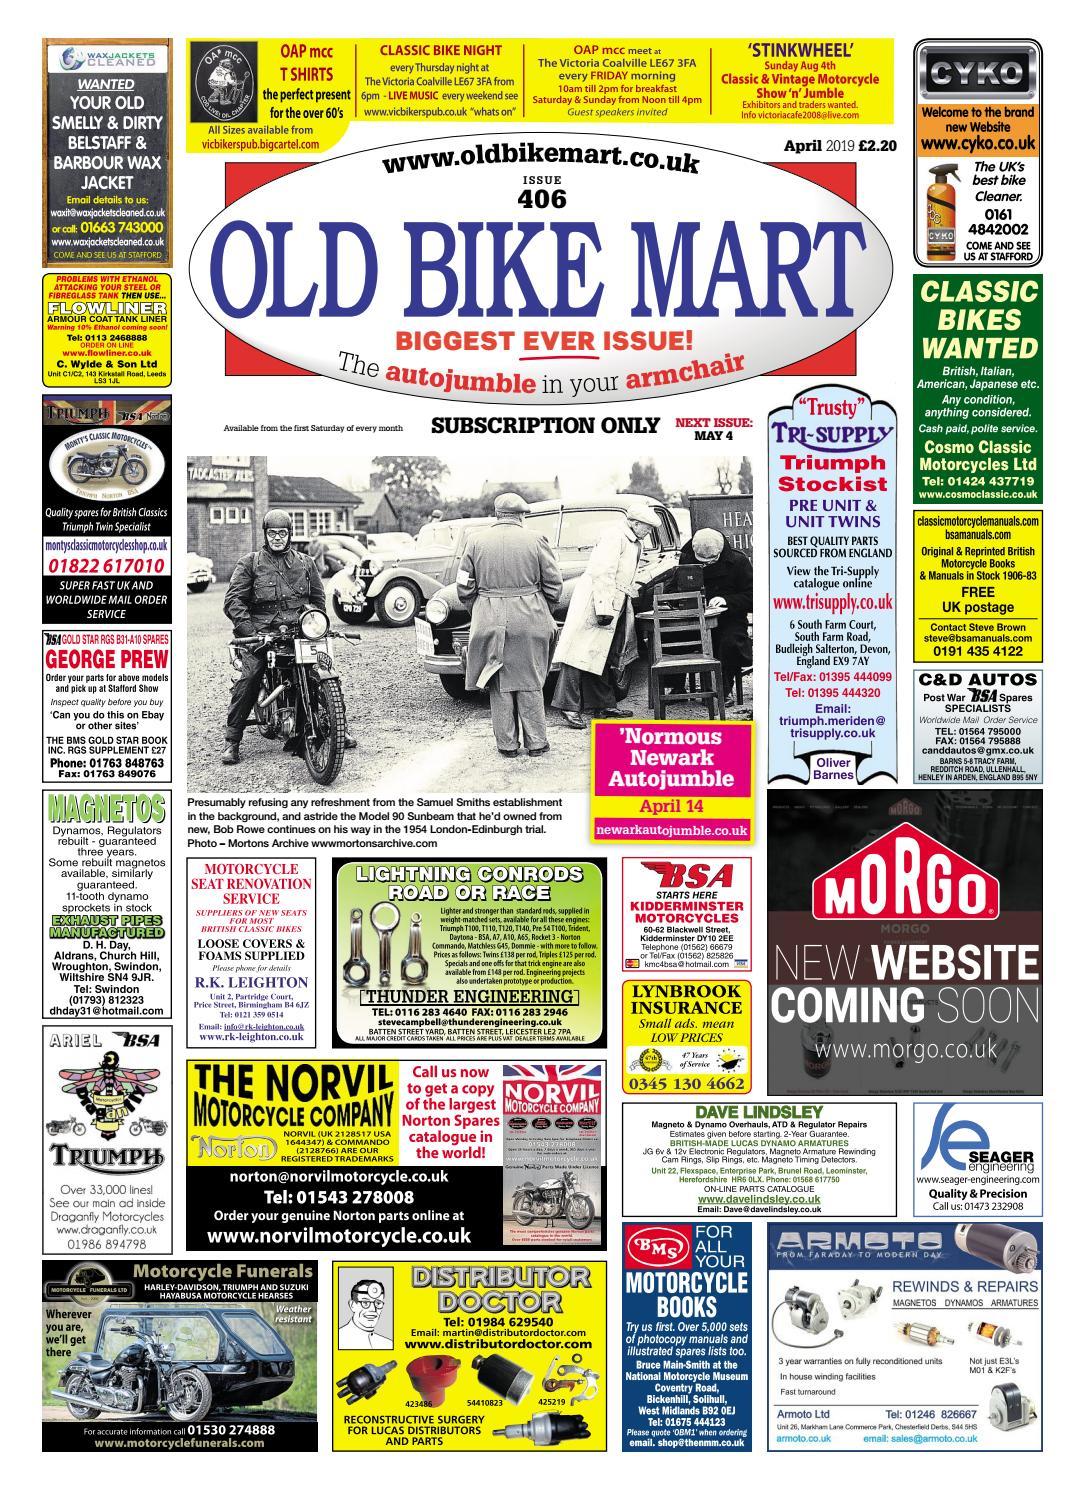 Old Bike Mart - April 2019 - Preview by Mortons Media Group